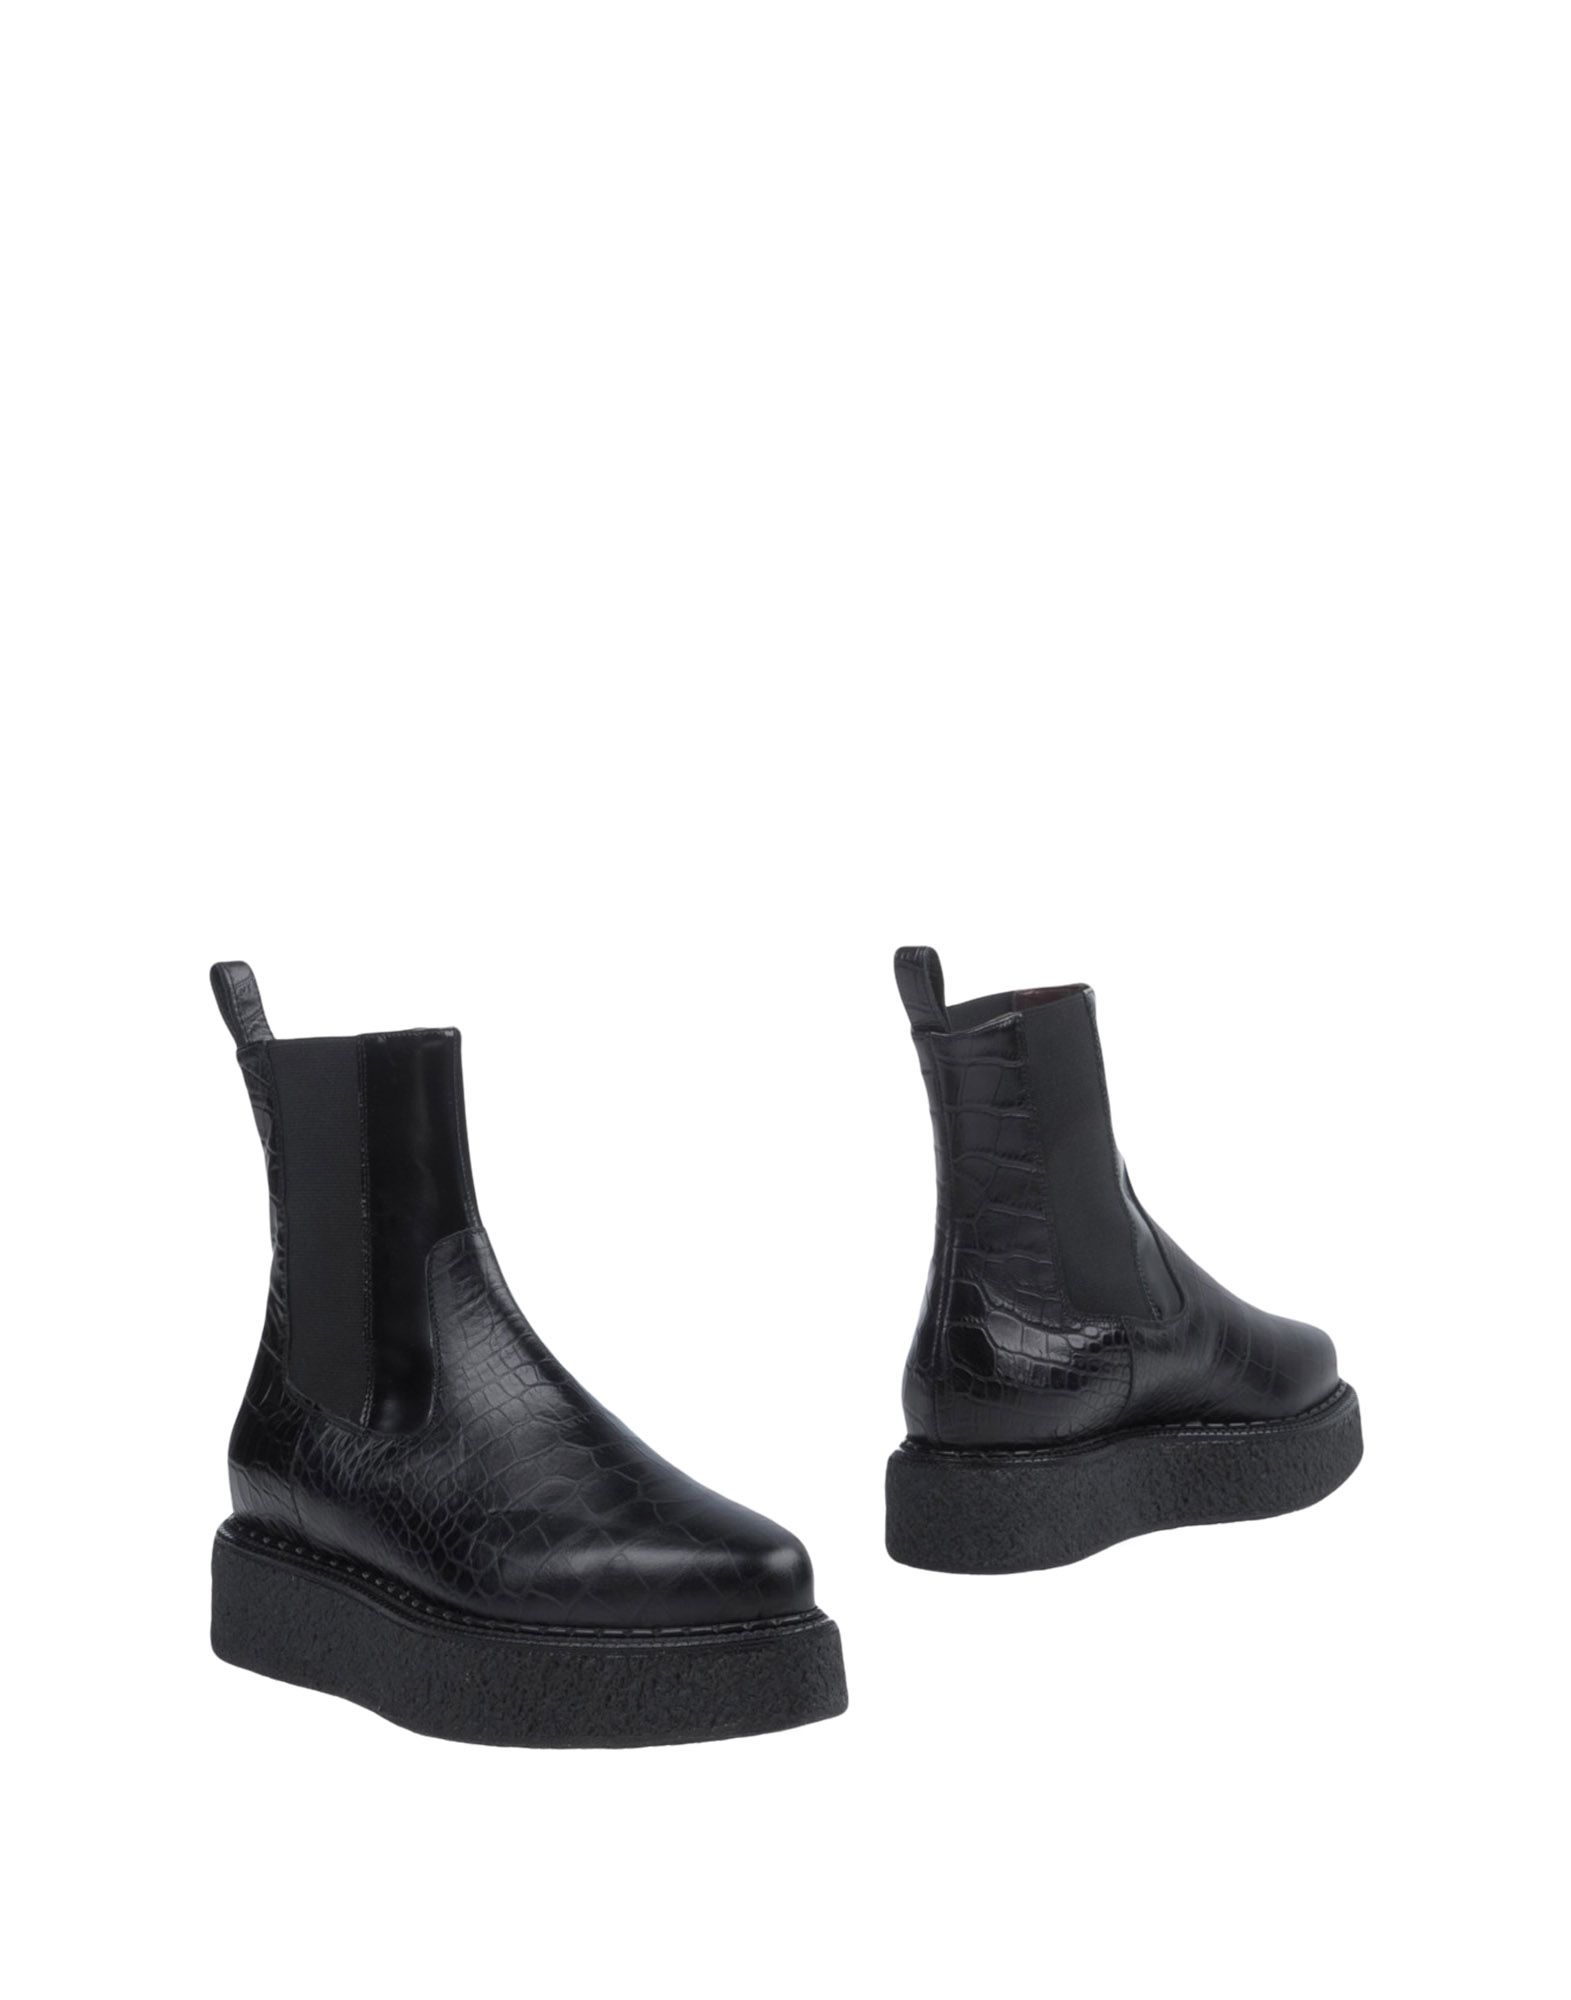 Antonio Marras Chelsea Boots Damen  11386524GFGut aussehende strapazierfähige Schuhe